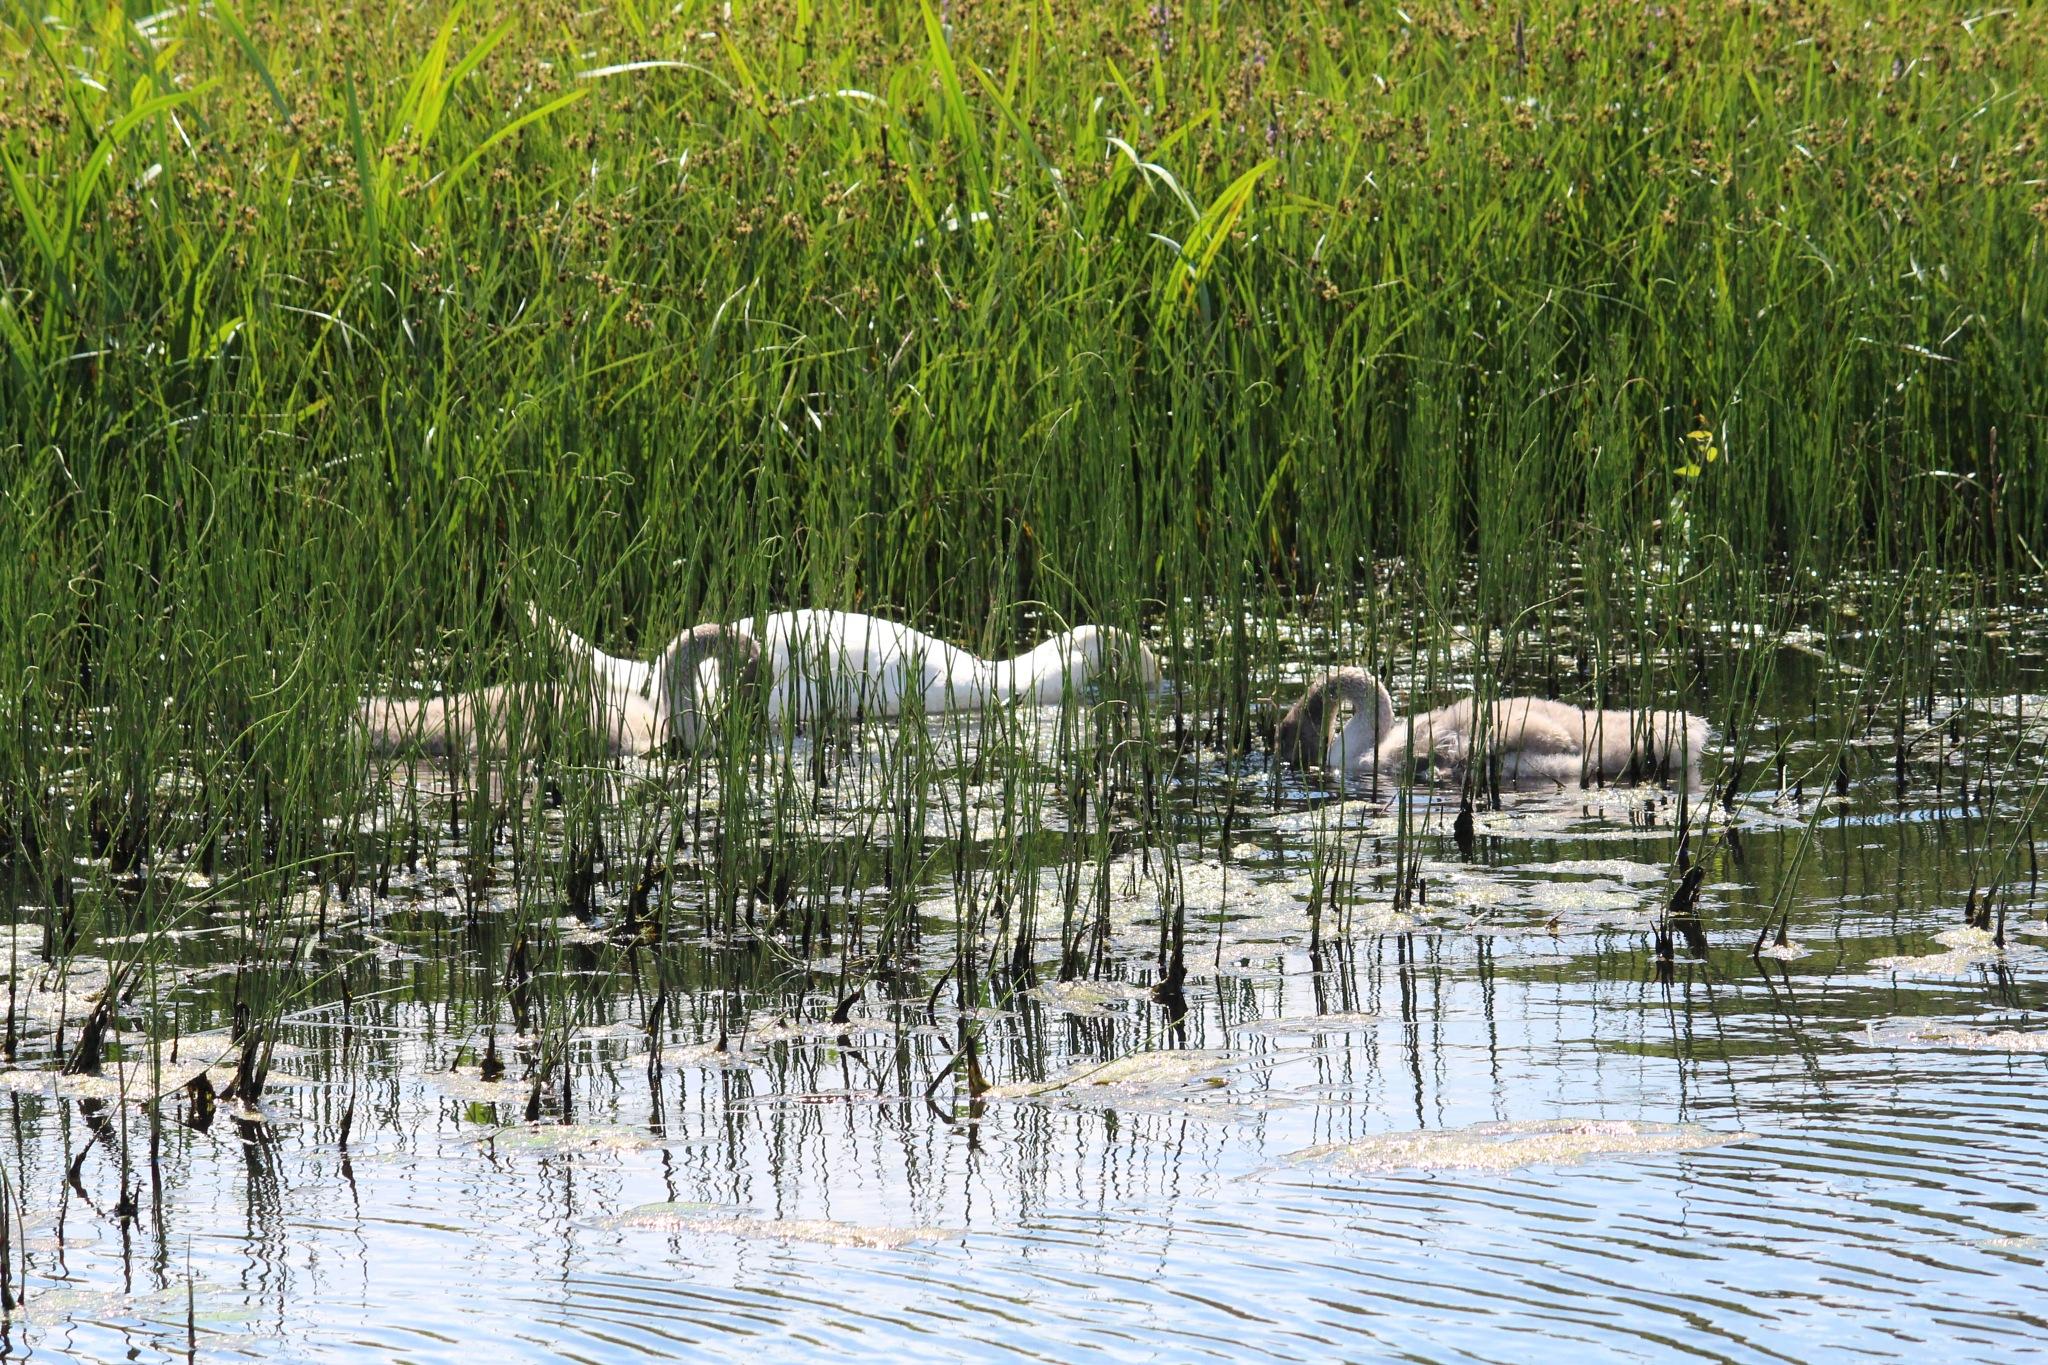 Swans feeding time by FrankieS